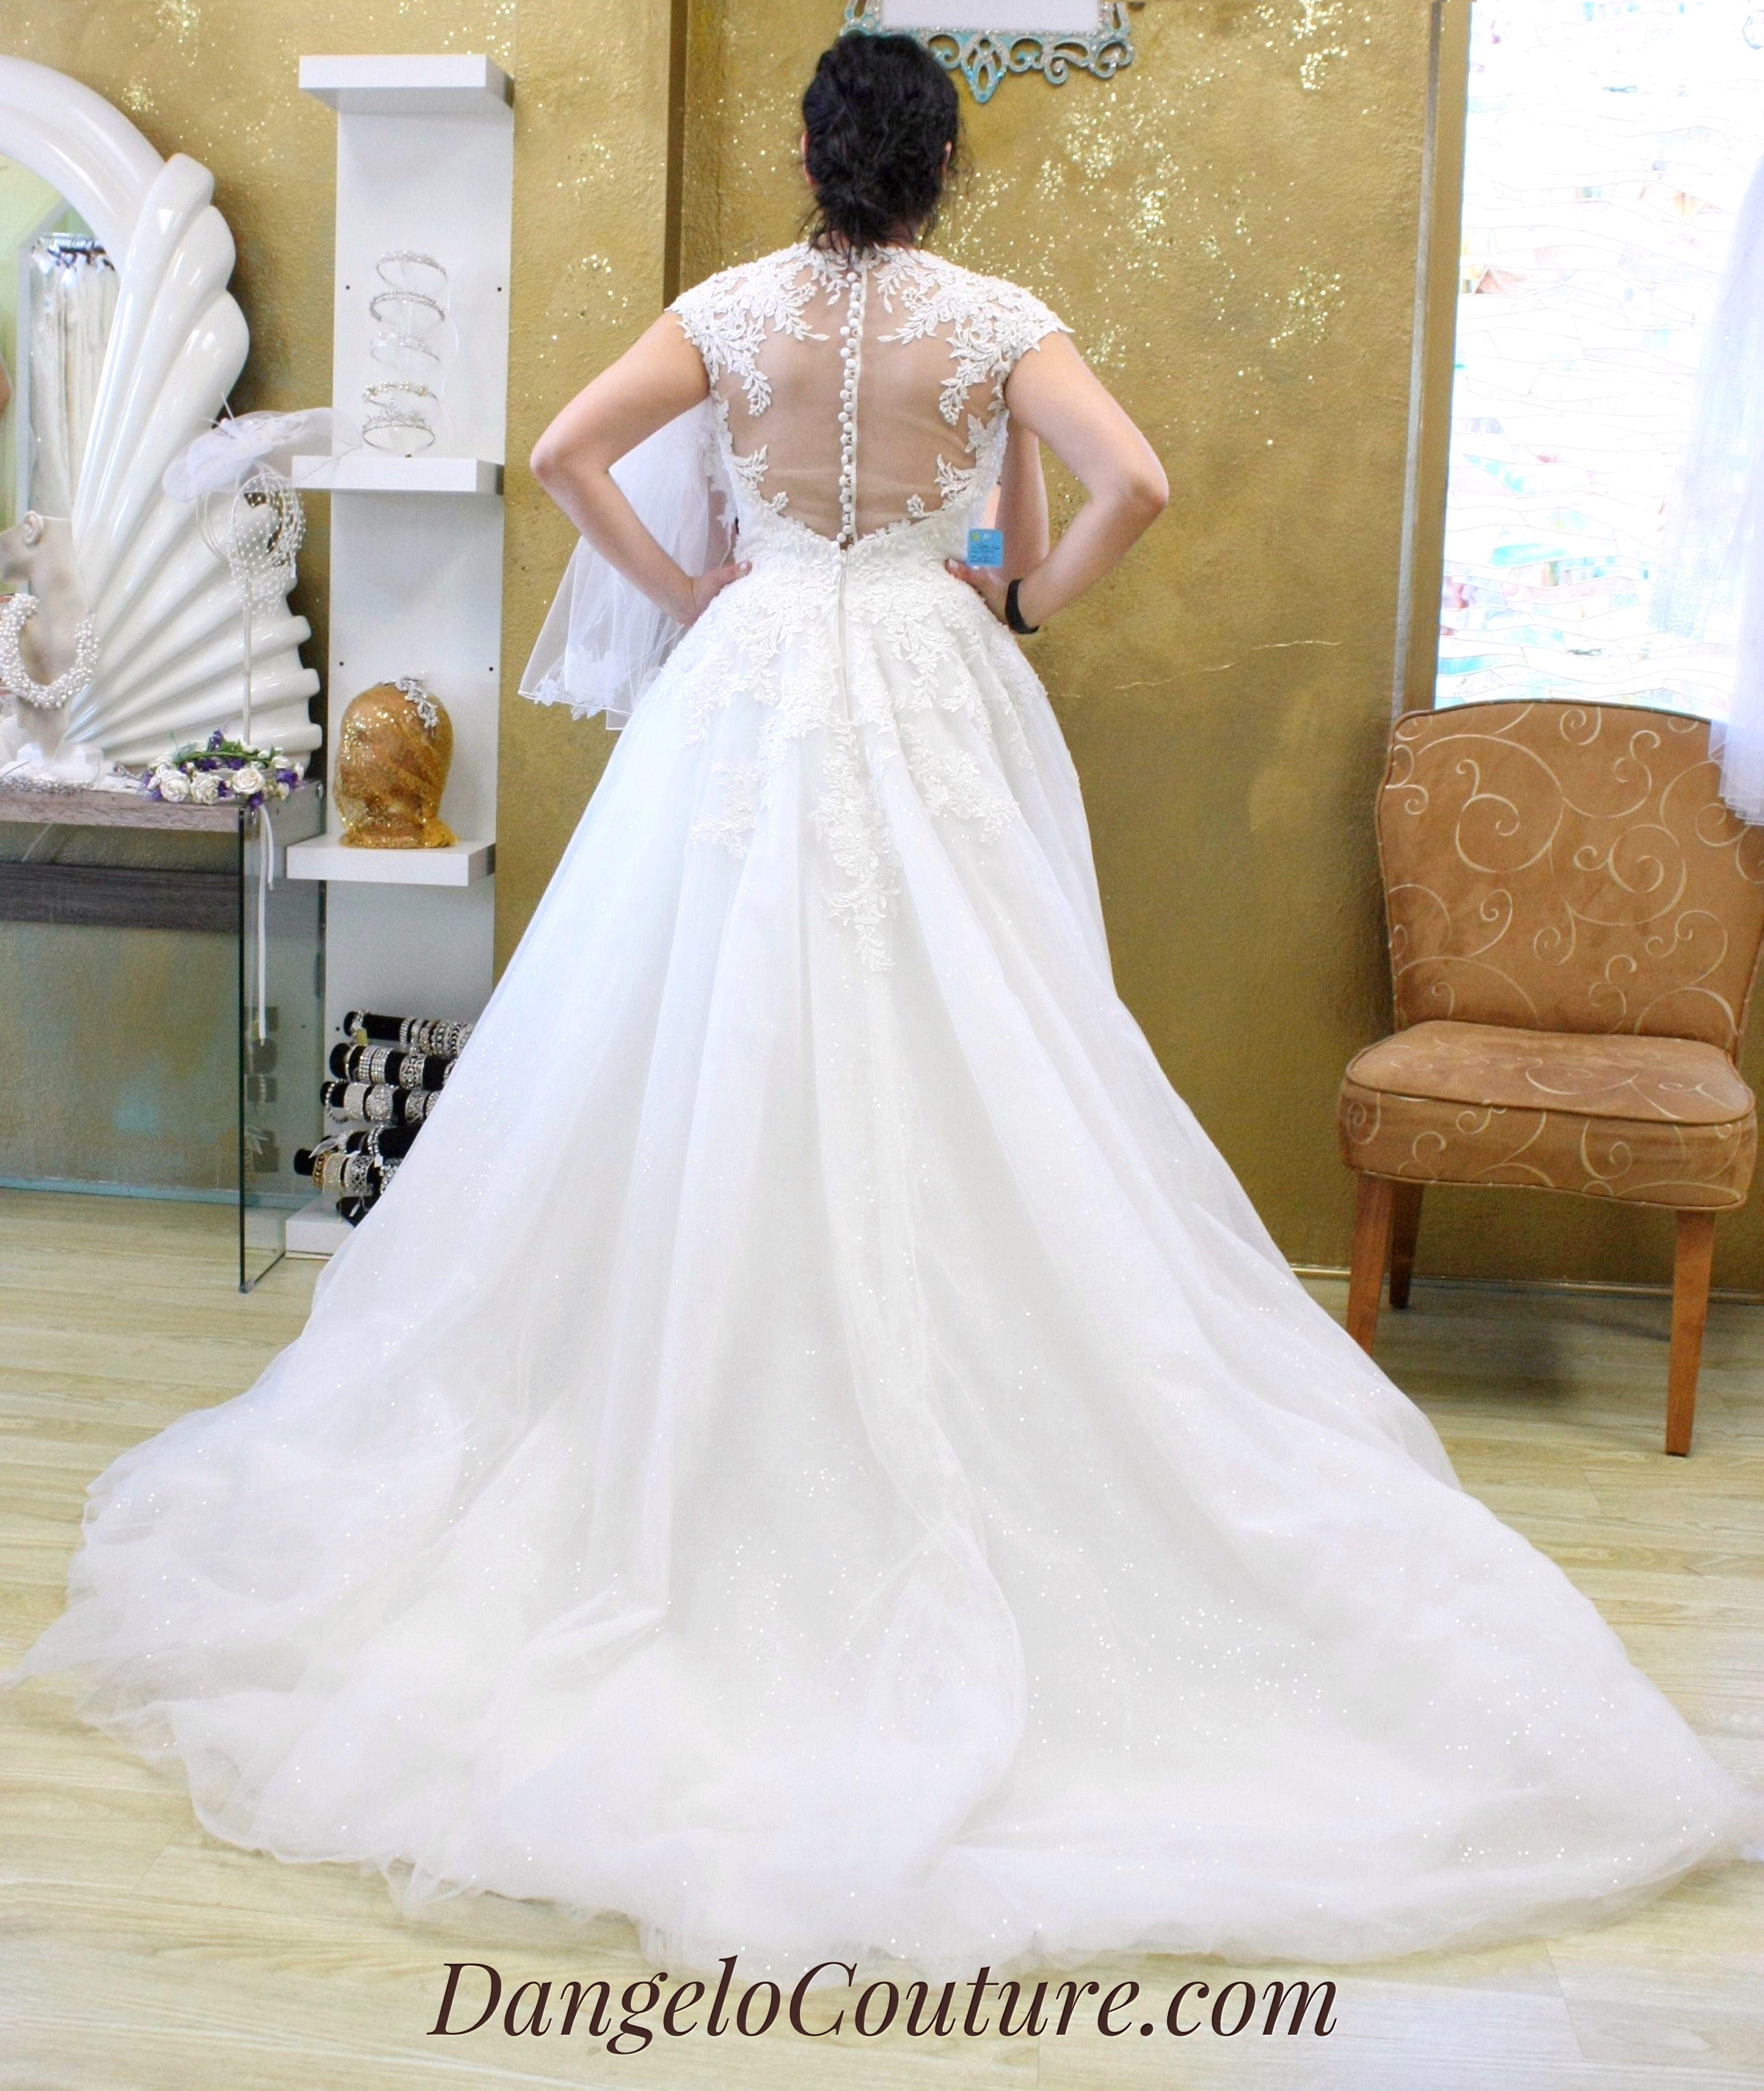 Beautiful D Angelo Wedding Dresses Sketch - Wedding Dress Ideas ...